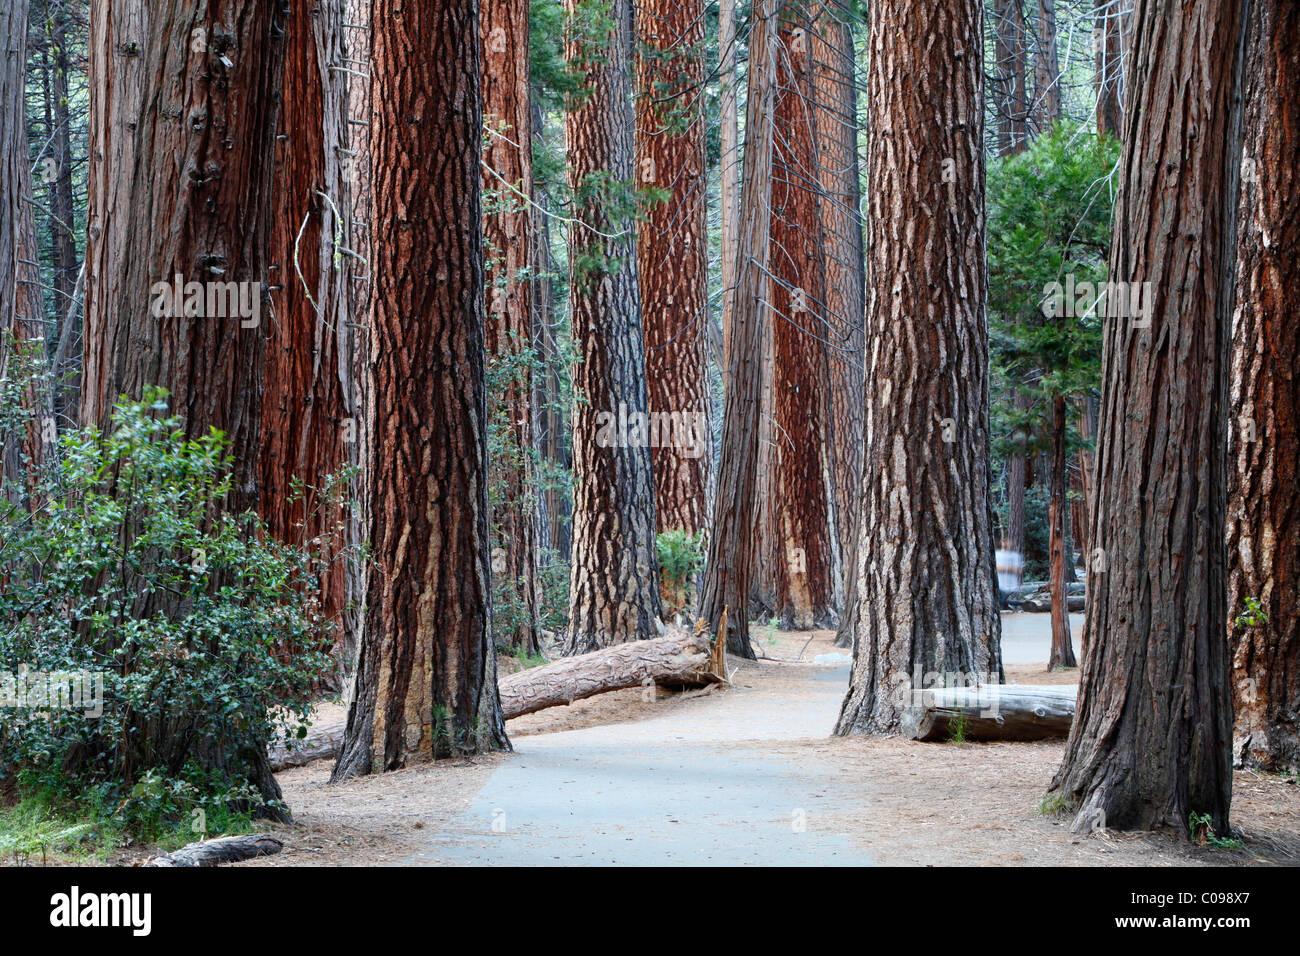 Redwoods, sequoias (Sequoioideae), Yosemite National Park, California, USA - Stock Image